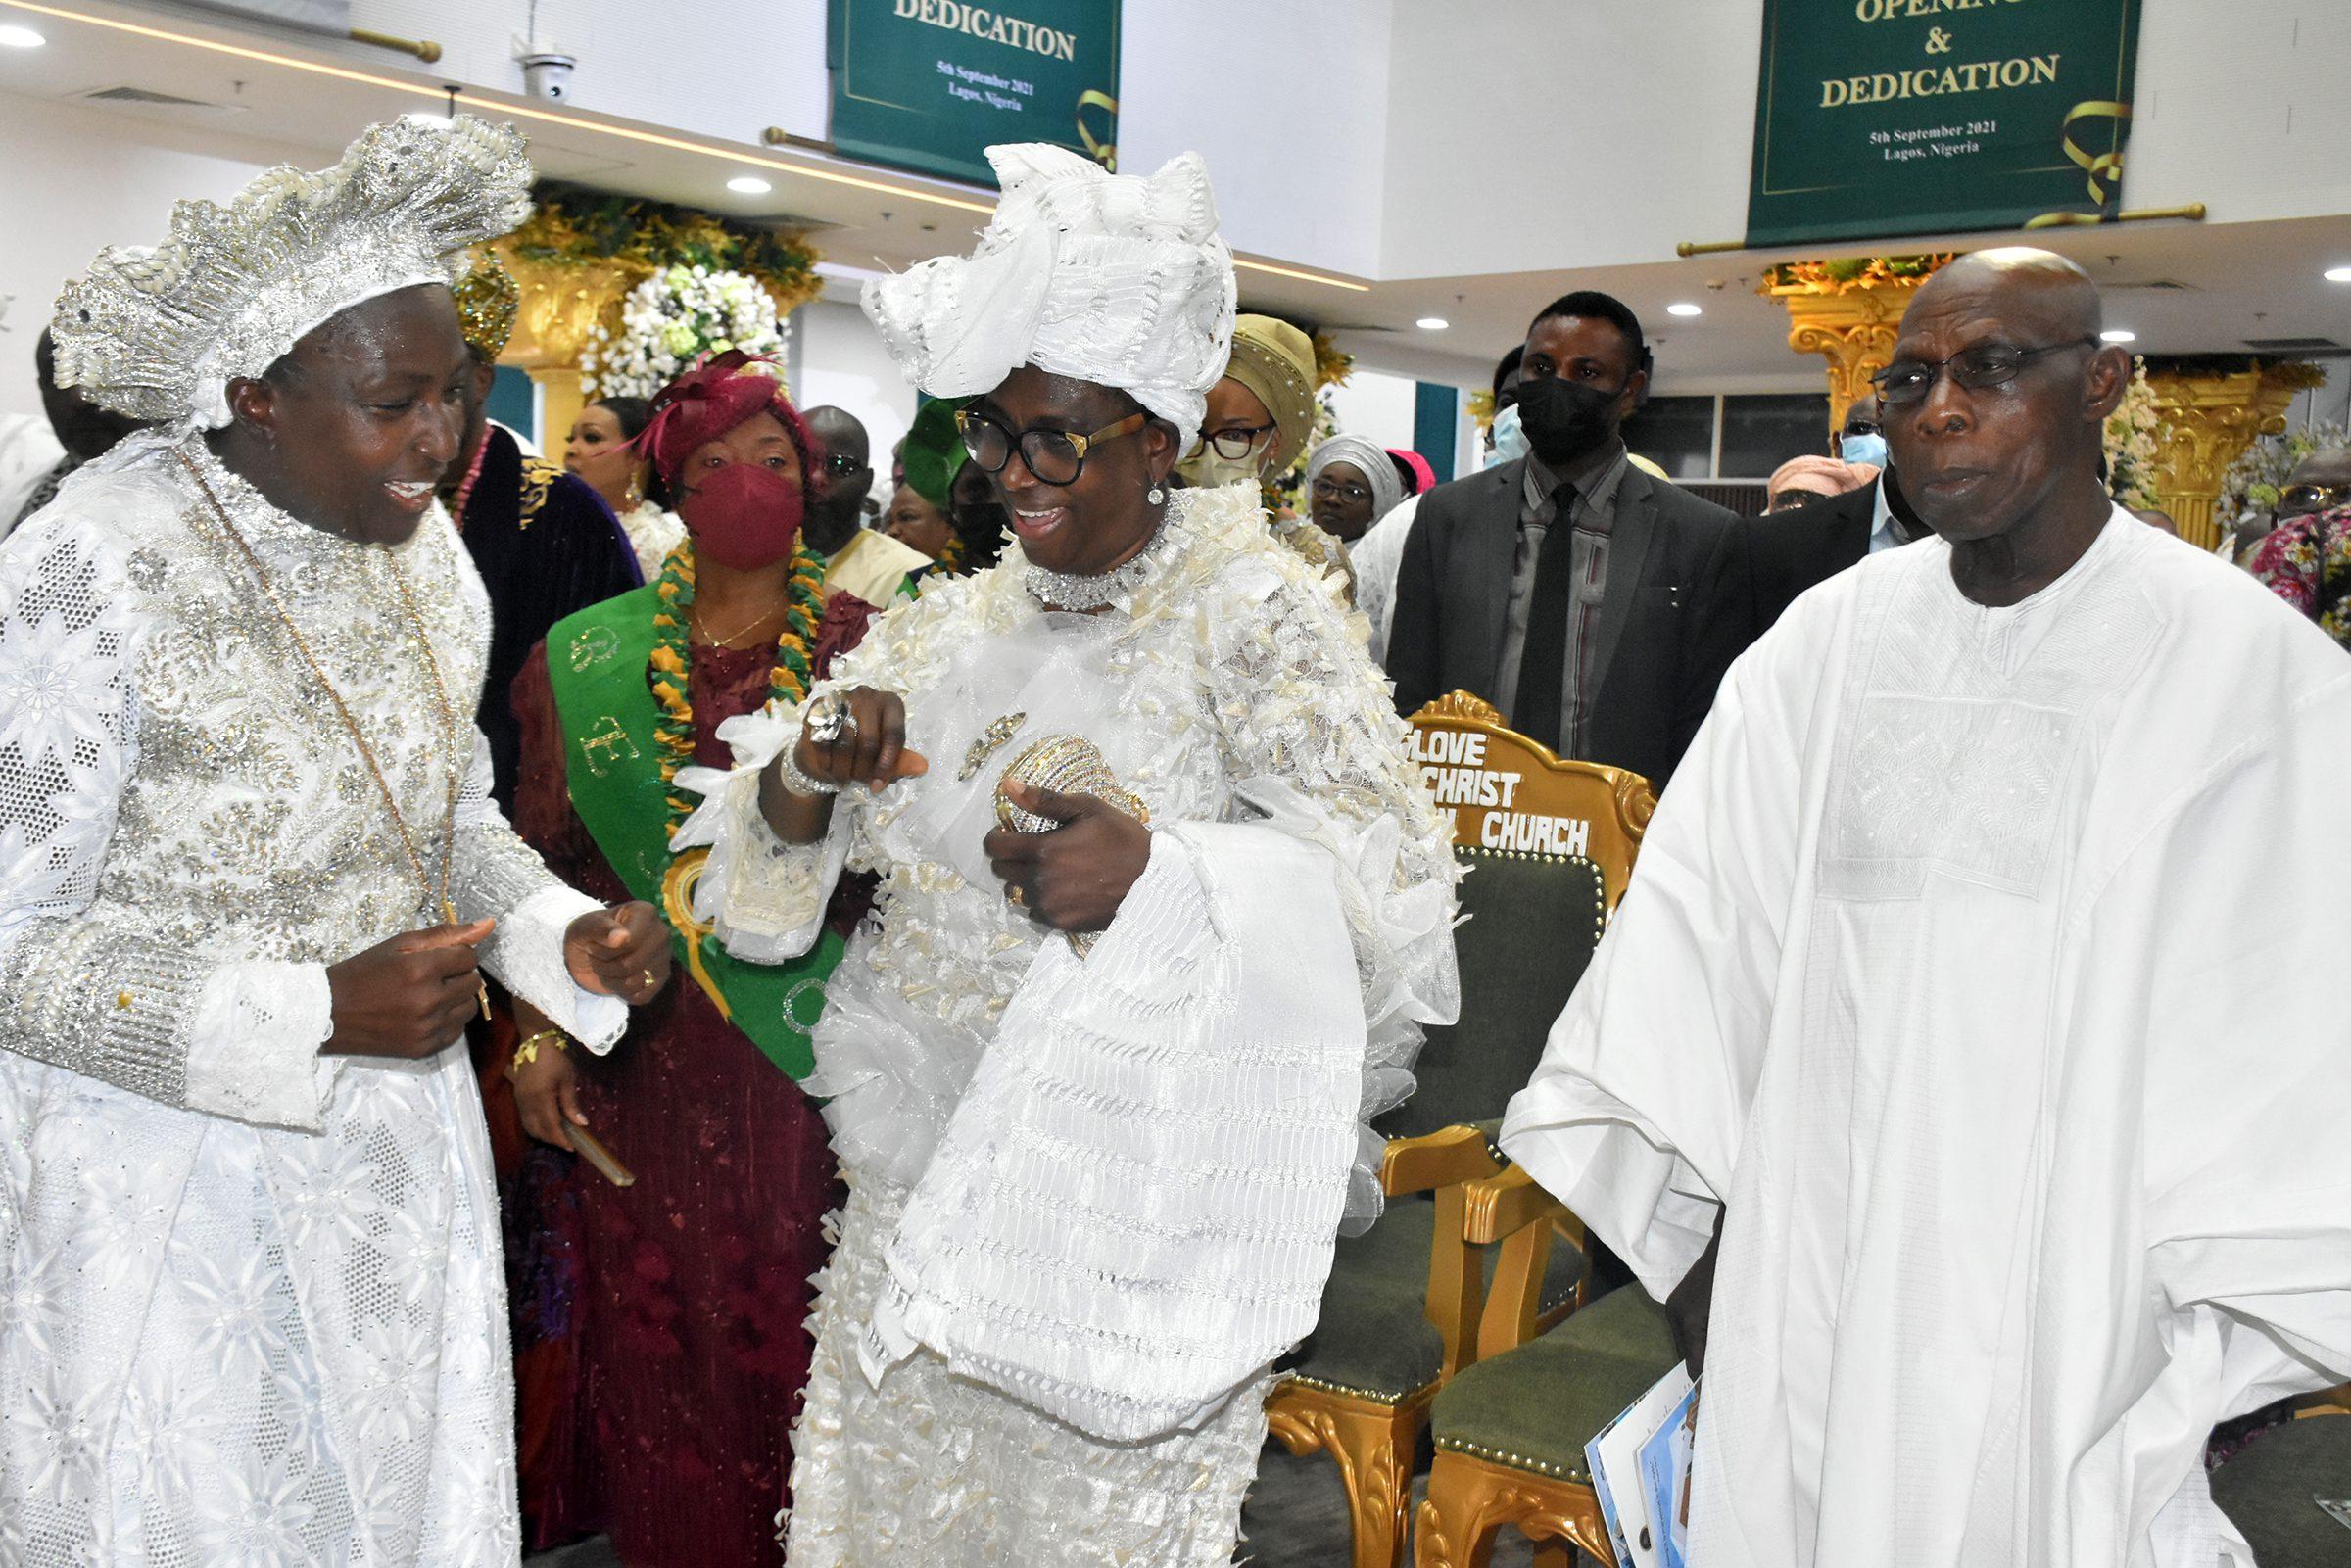 Obasanjo, Adeboye, Ooni at the dedication of Love of Christ Generation  Church Cathedra